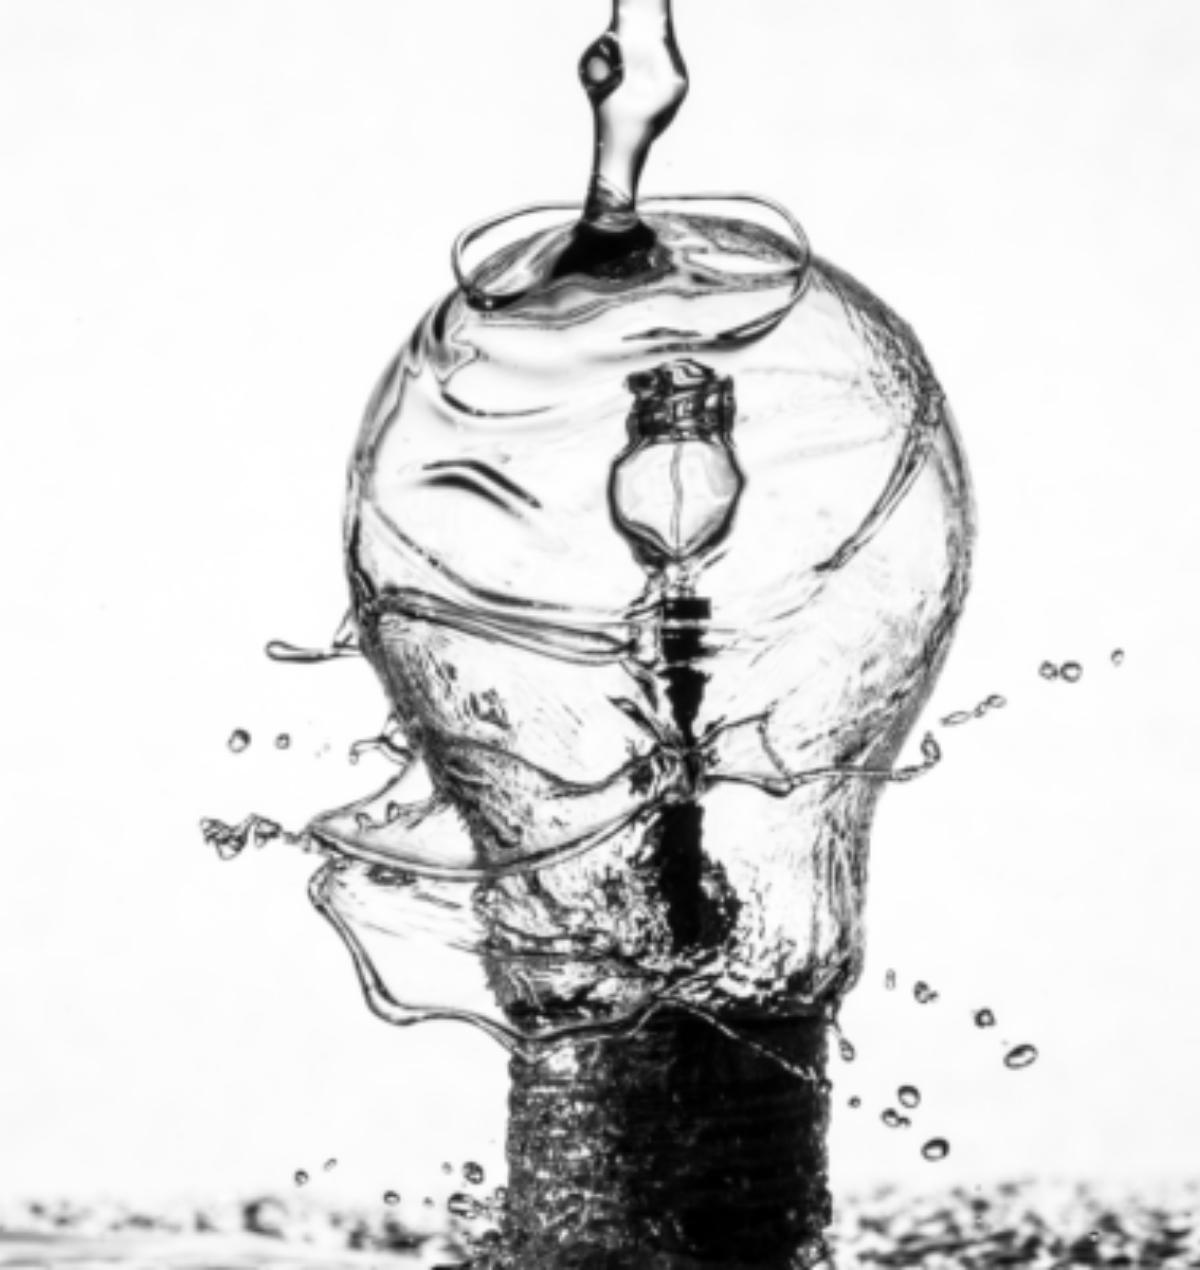 mason-rak-insights-image-bulb-water